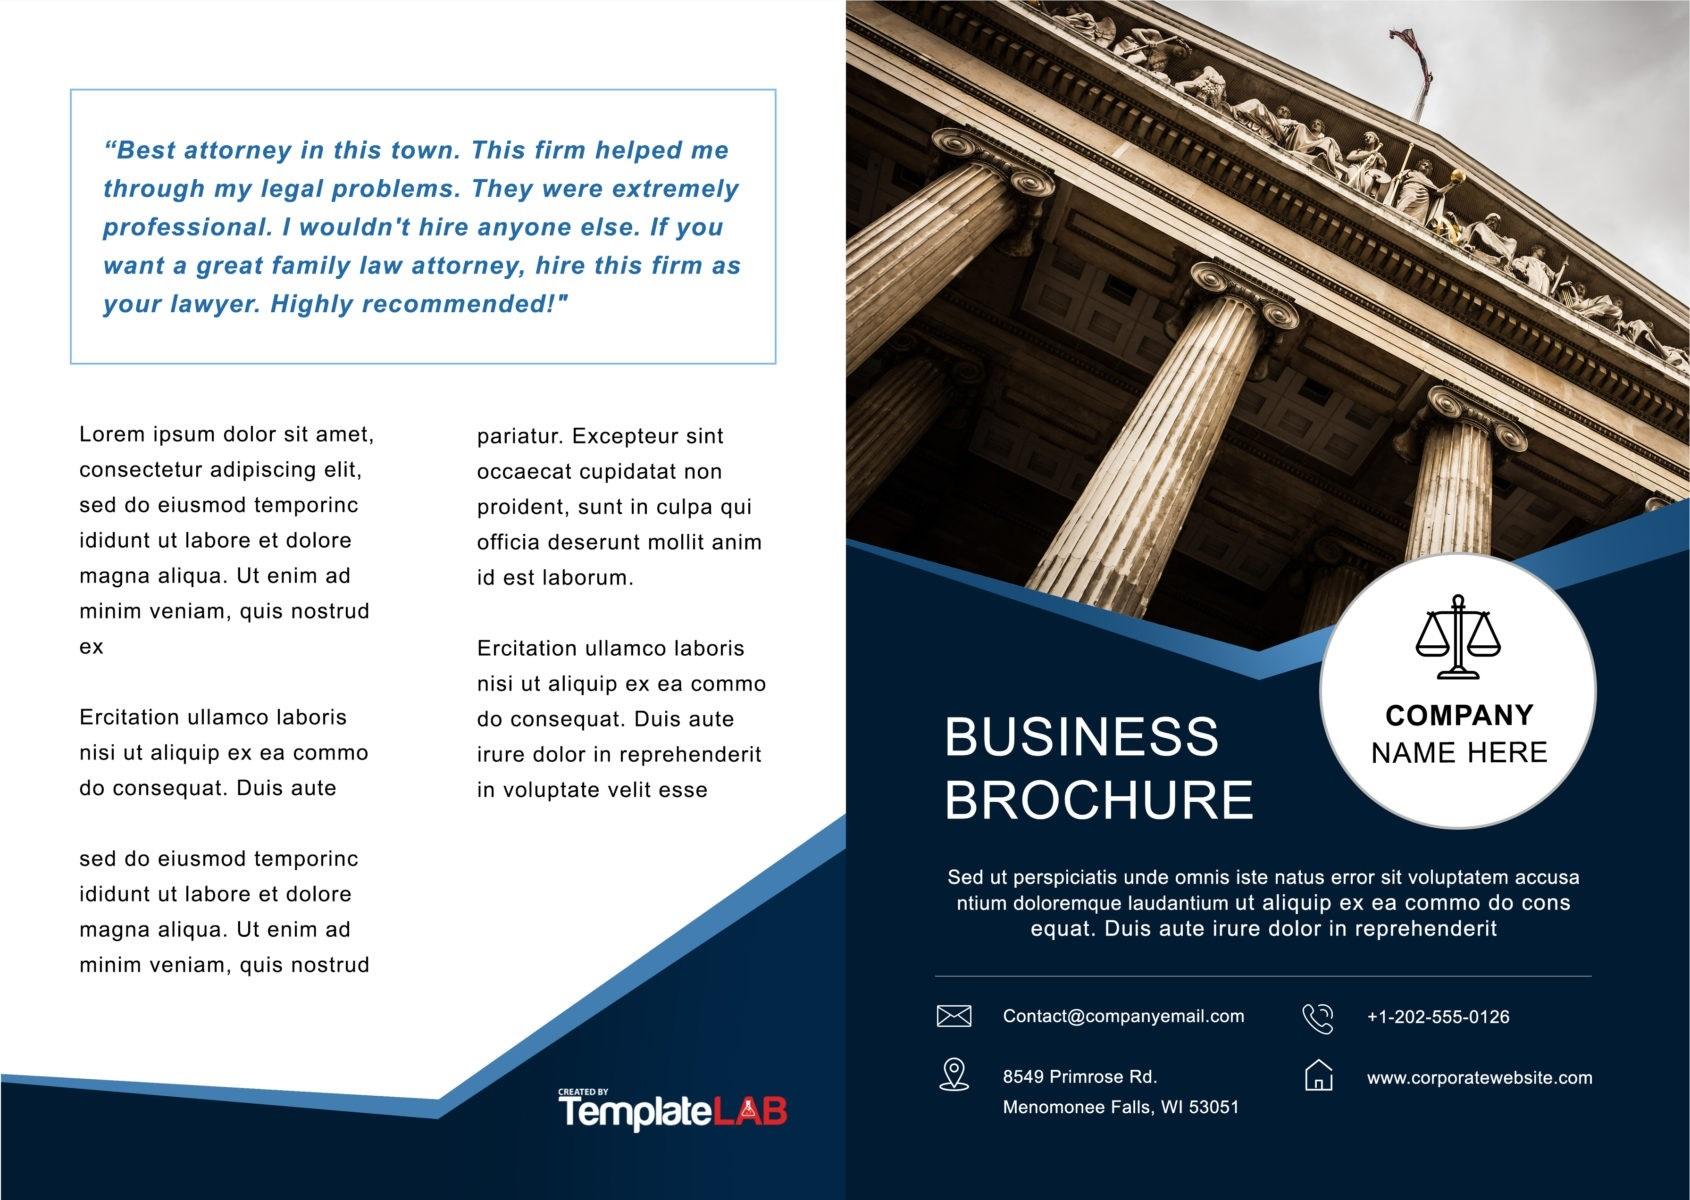 003 Impressive Free Online Brochure Template Highest Clarity  Templates Download Microsoft Word Real EstateFull